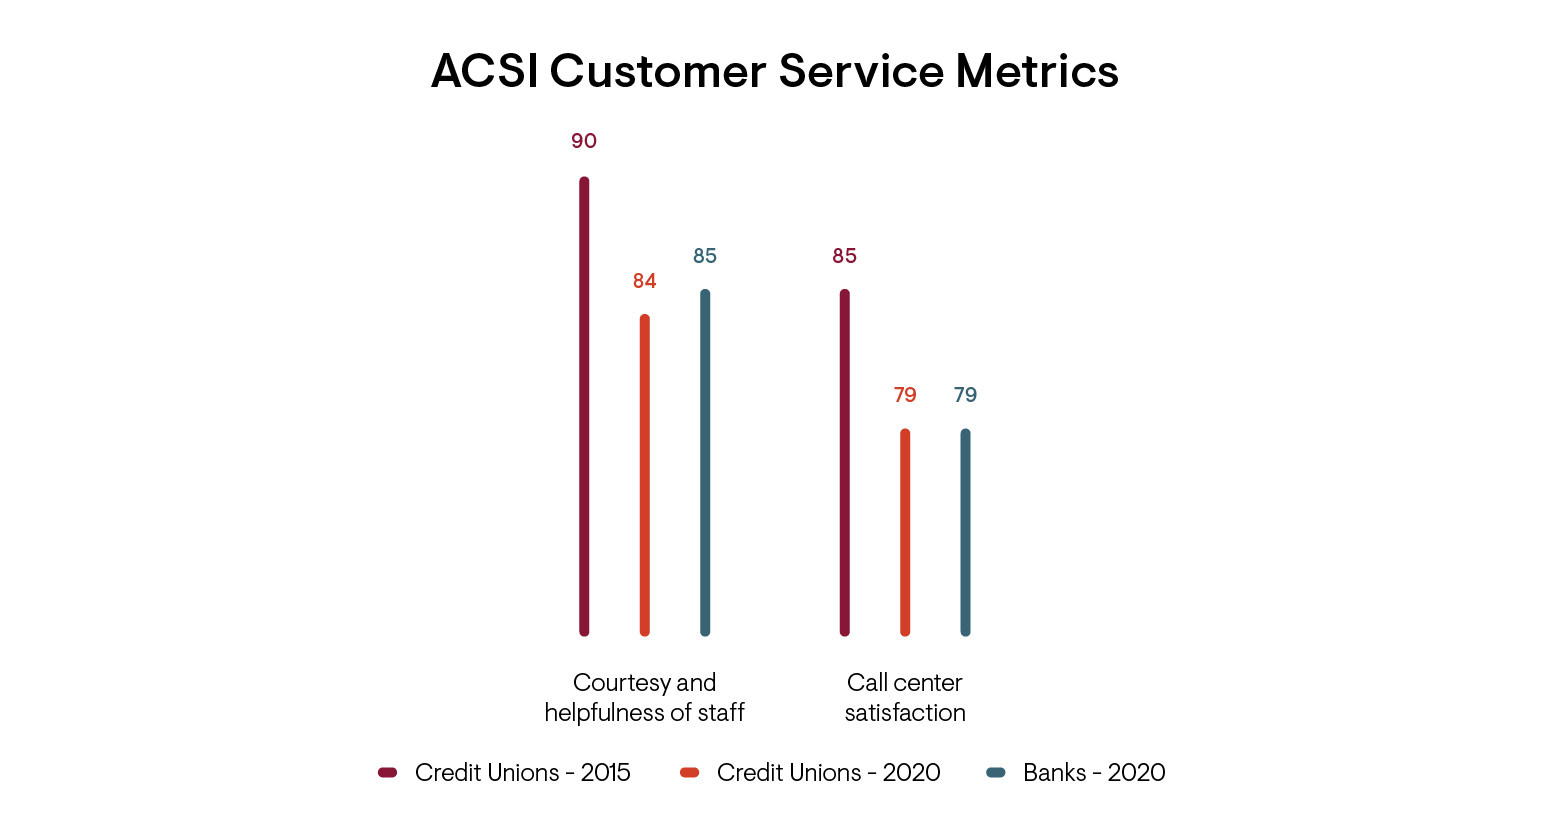 Graph of ACSI Customer Service Metrics